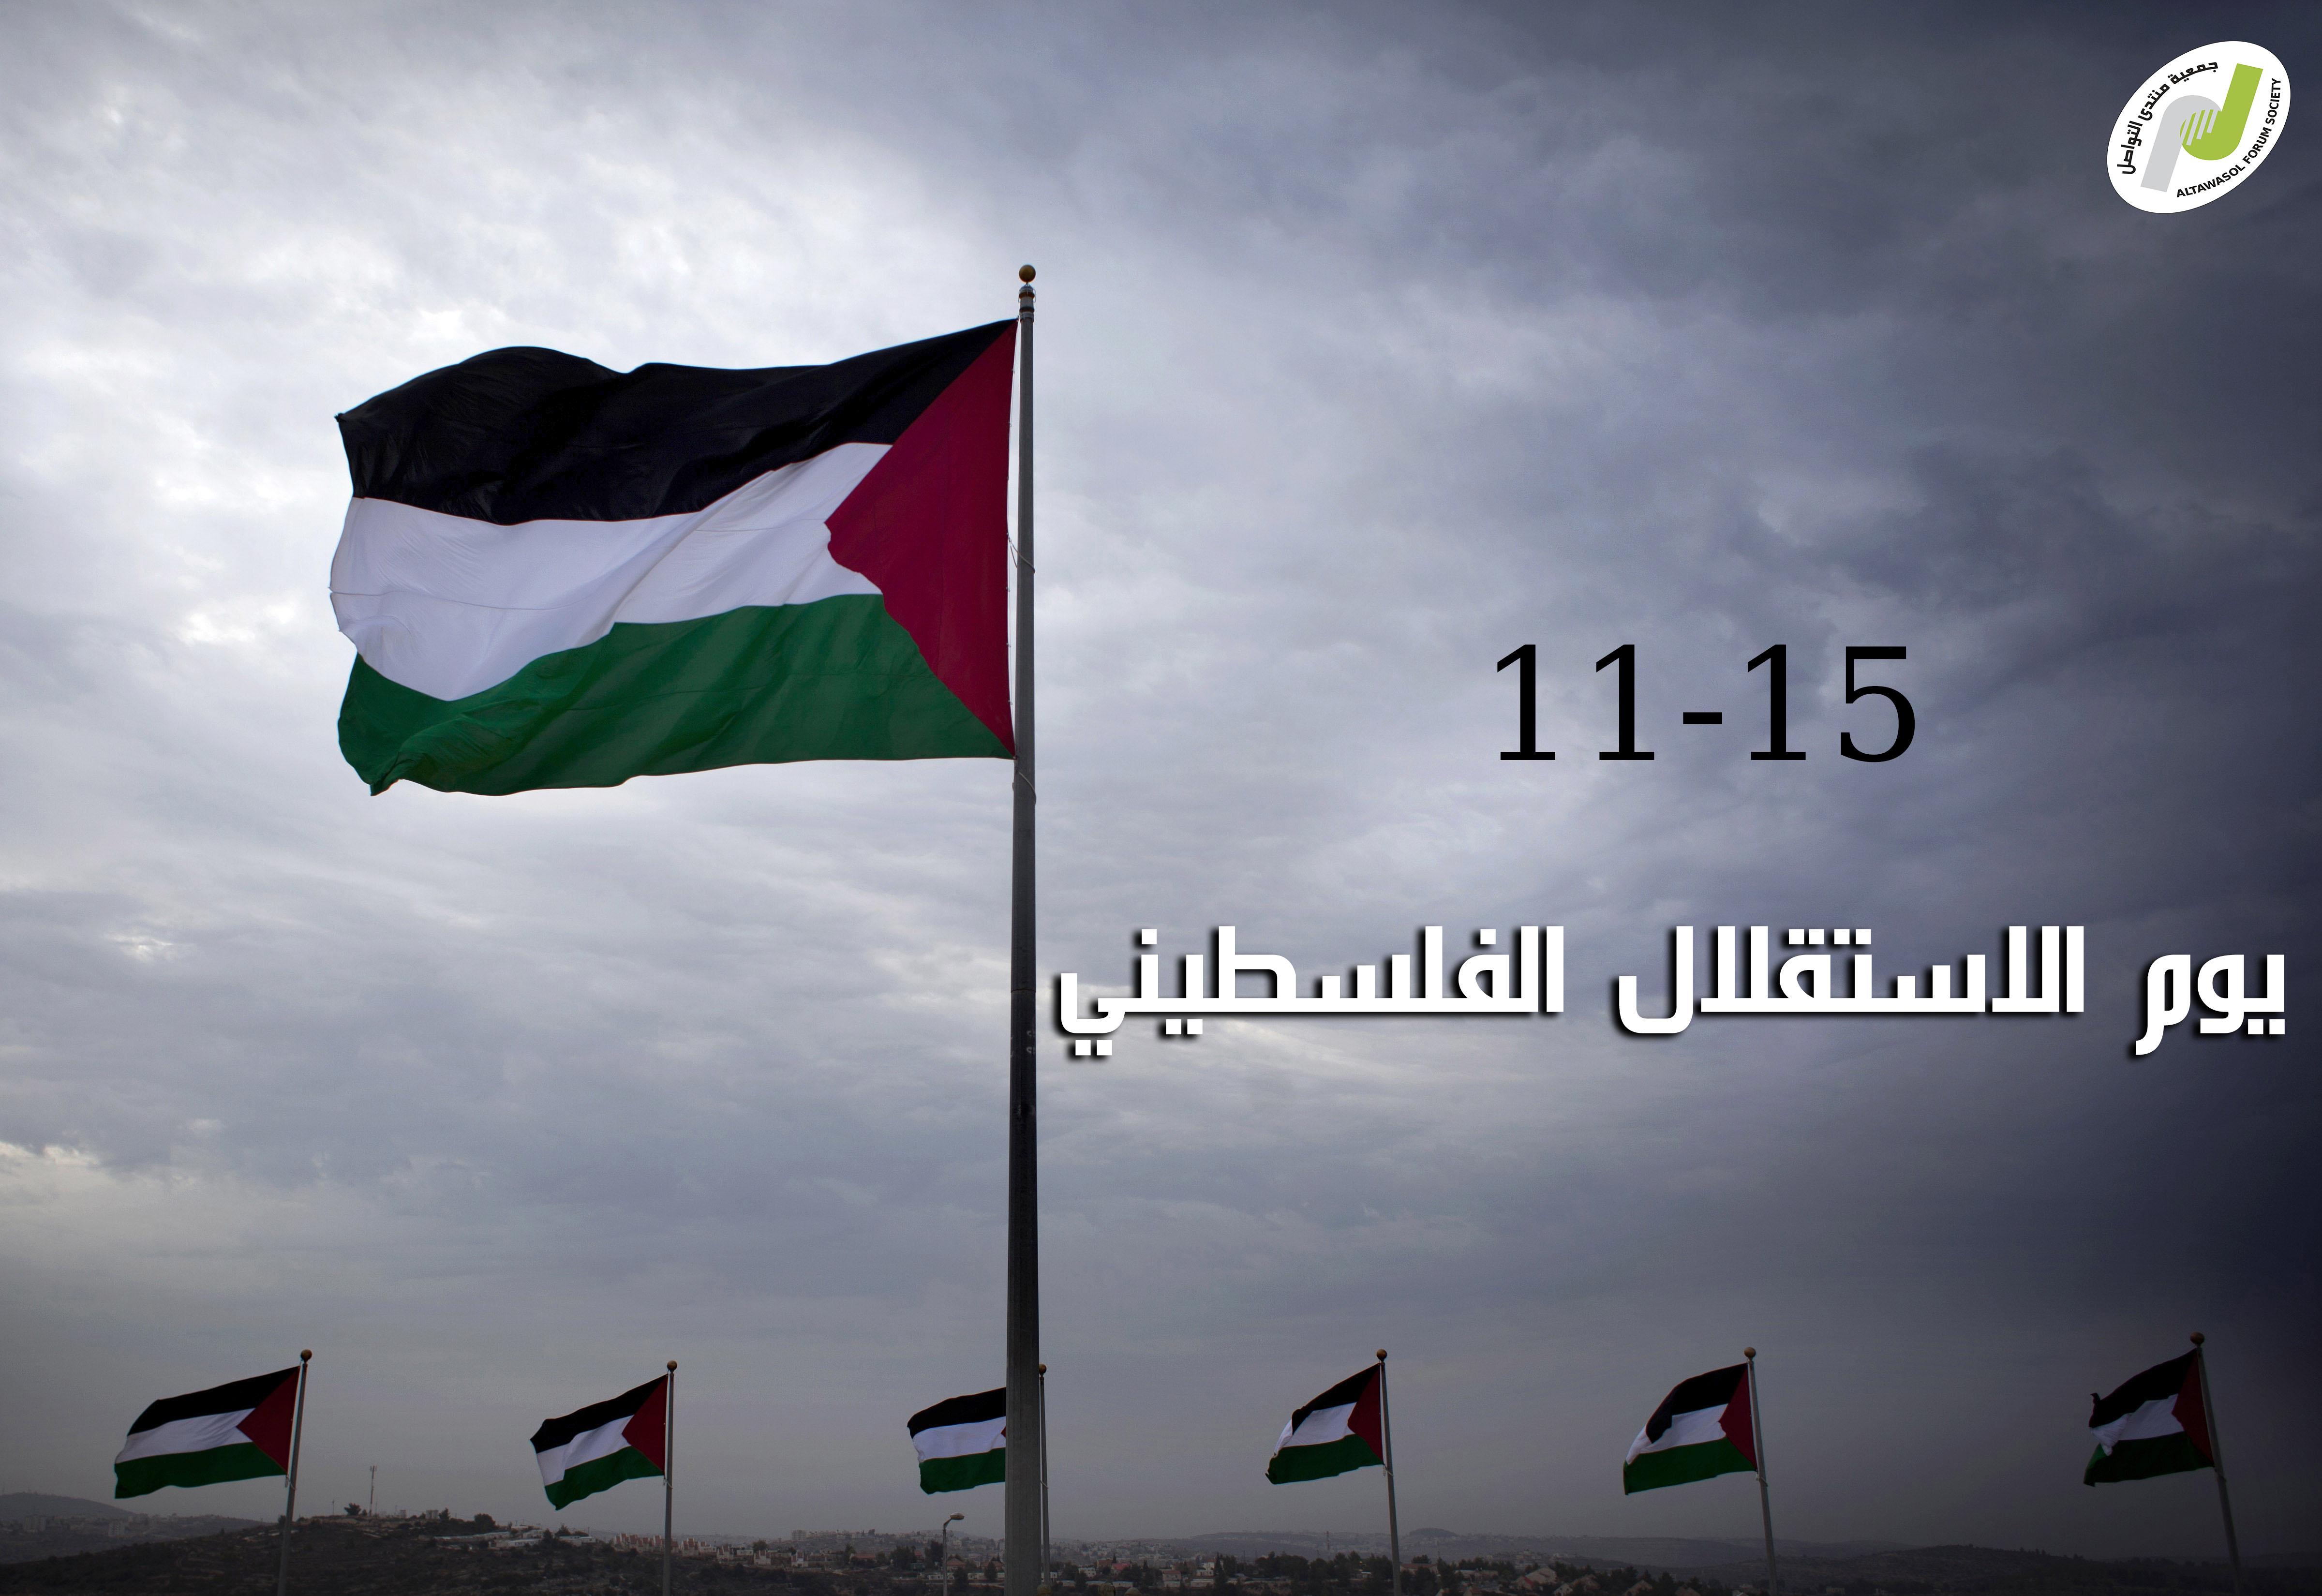 Mideast Palestinians Building Palestine